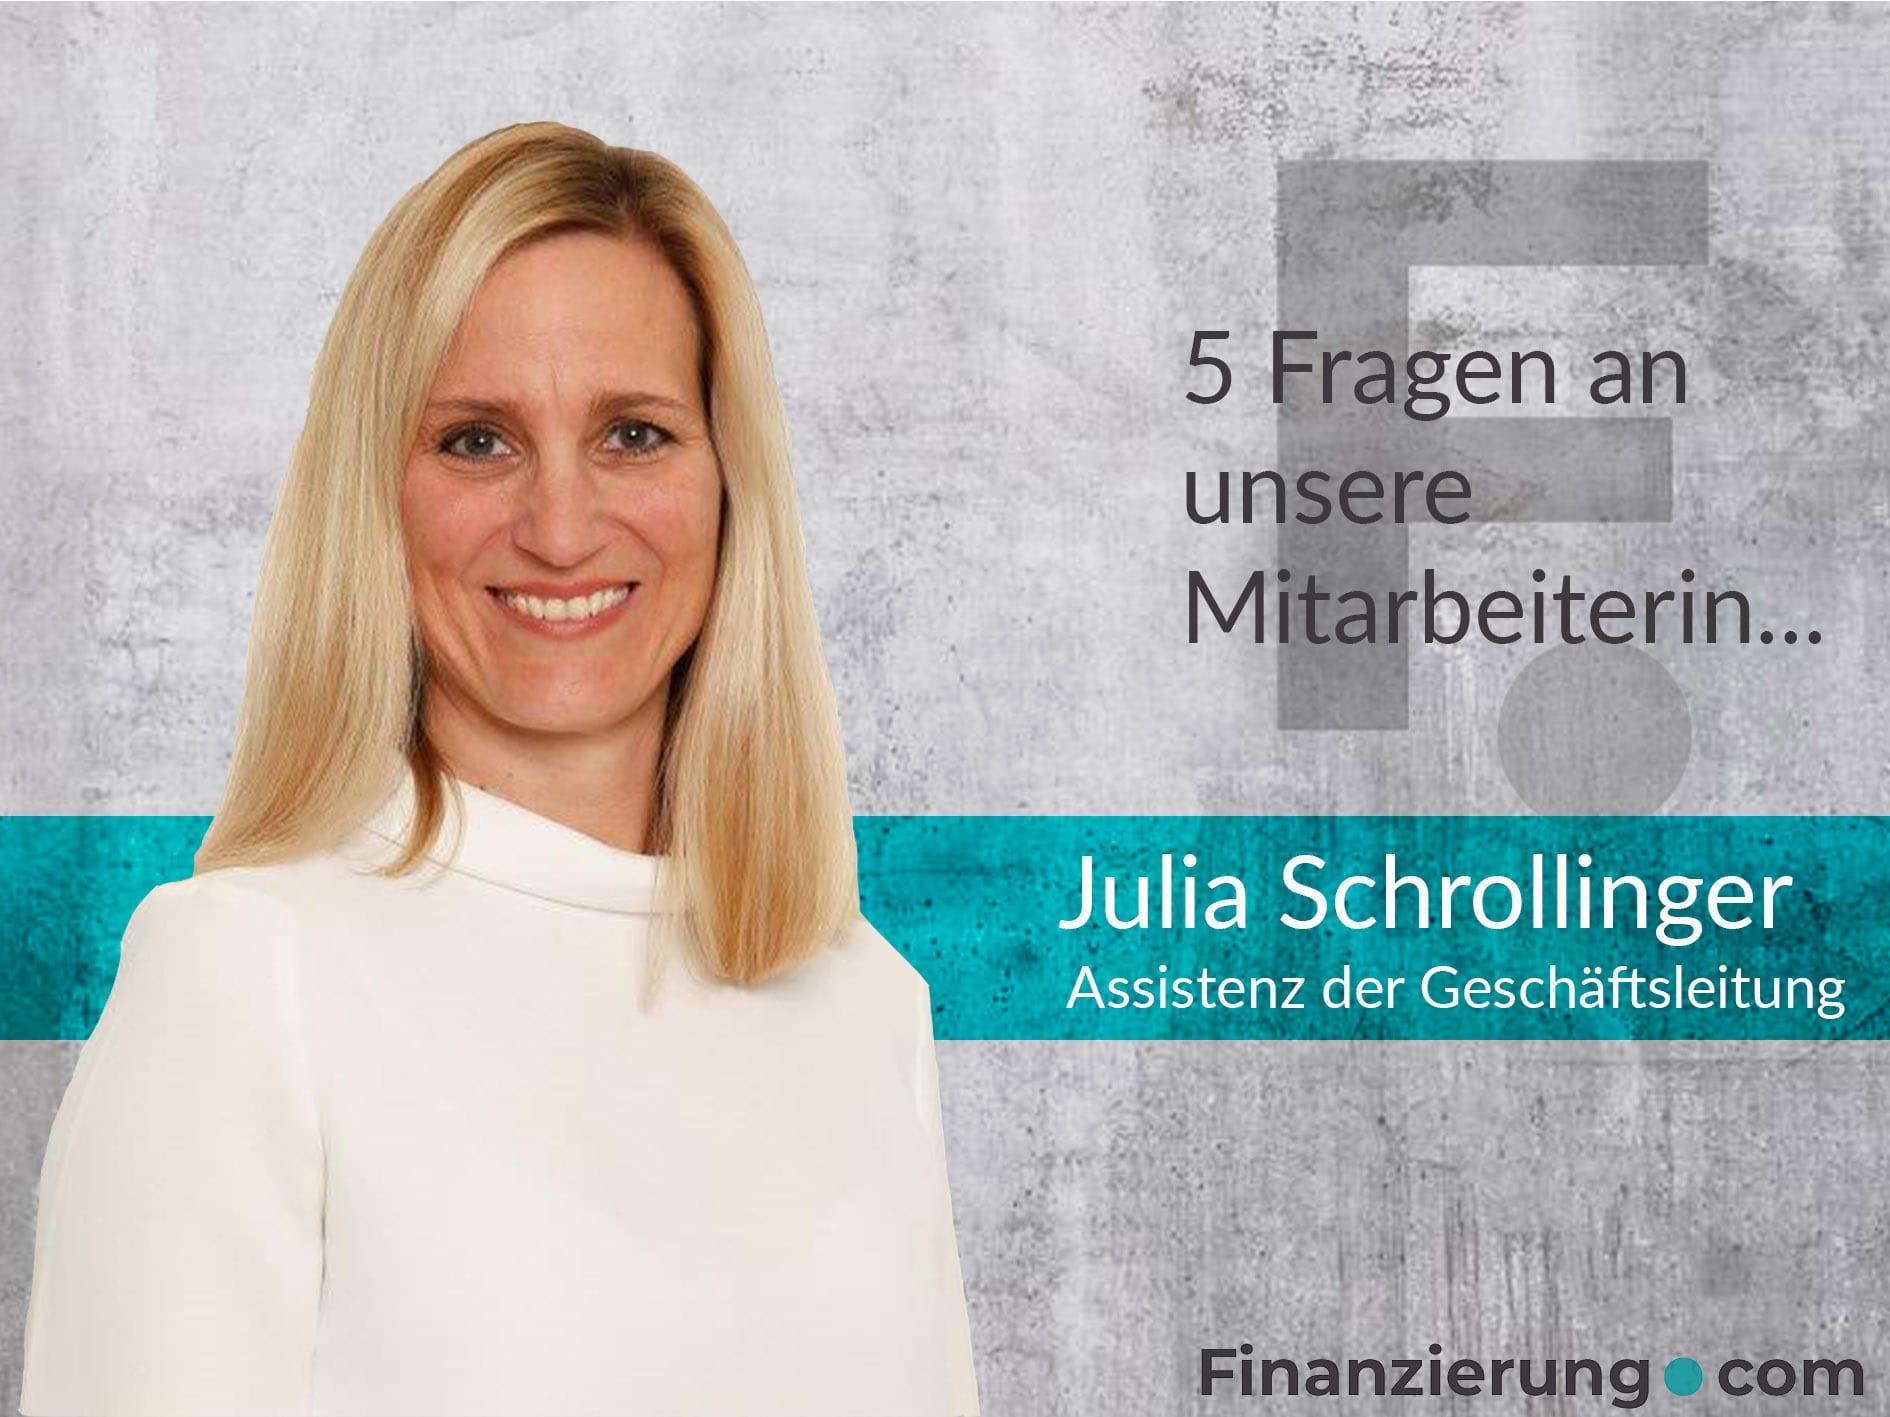 Julia Schrollinger